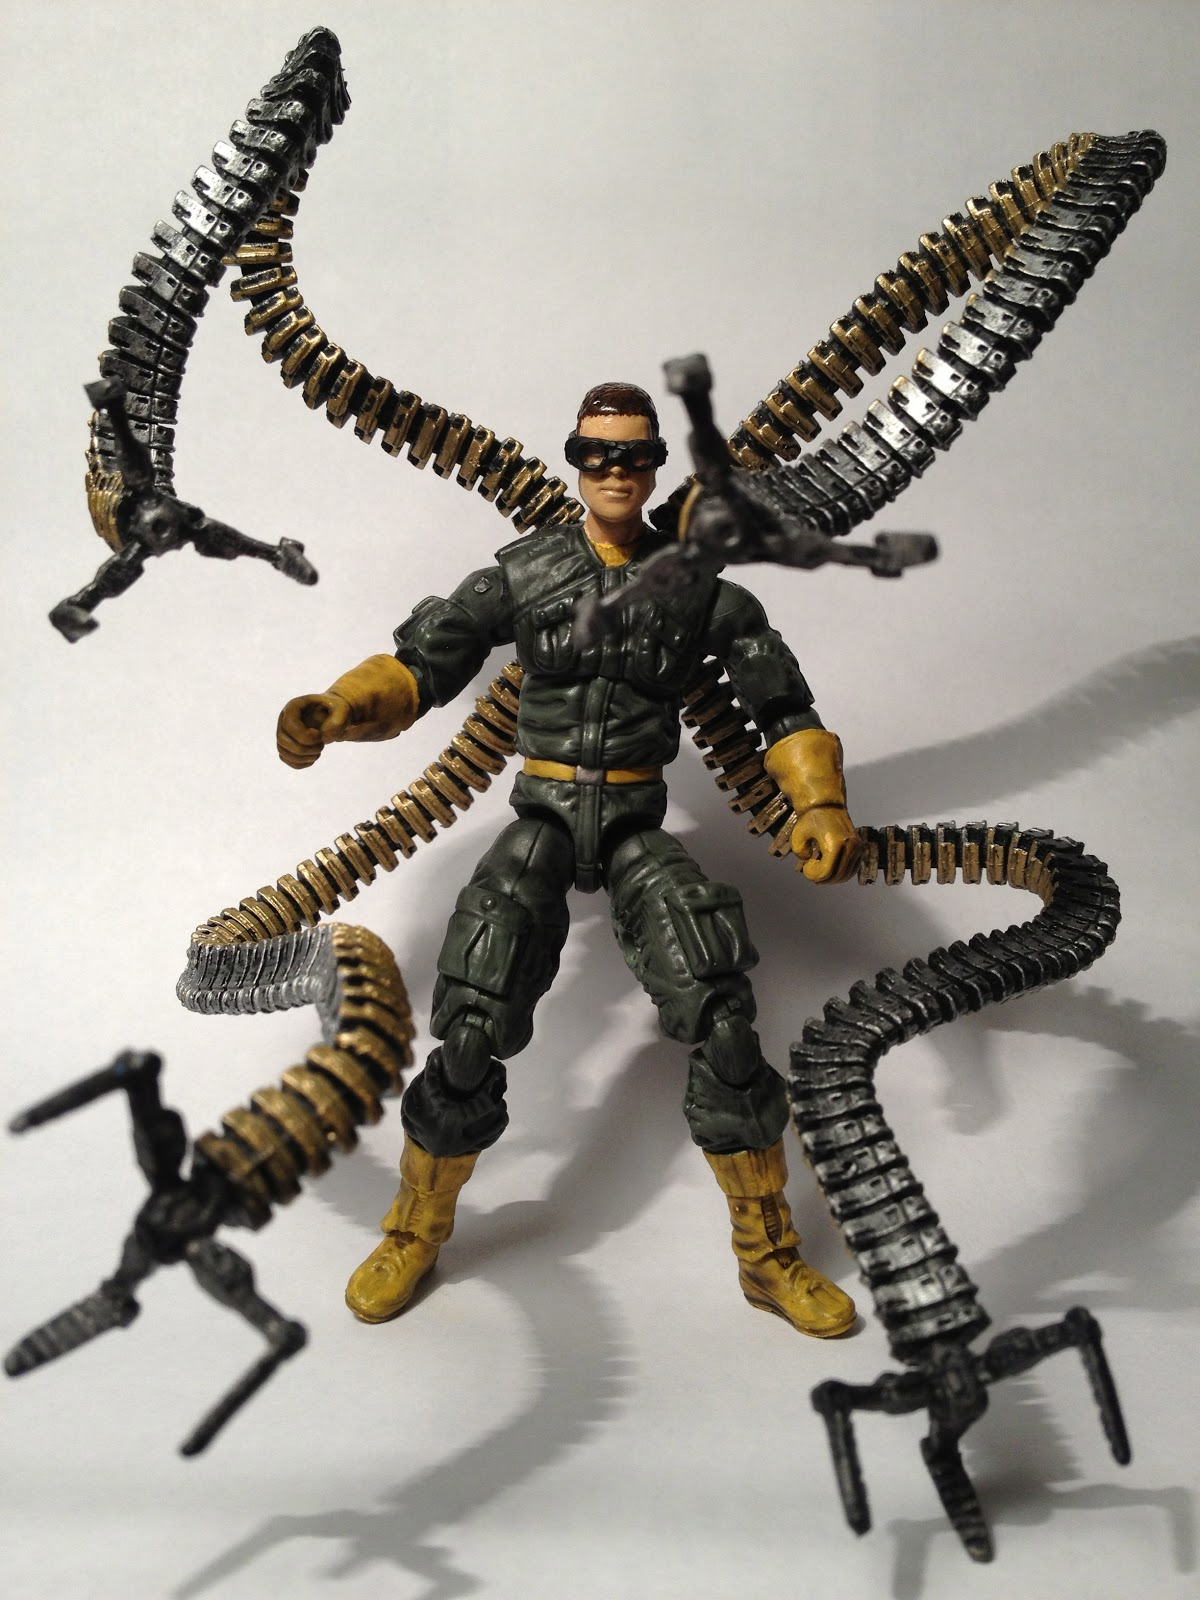 STRANGE LABS: THE AMAZING SPIDER-MAN & DOCTOR OCTOPUS